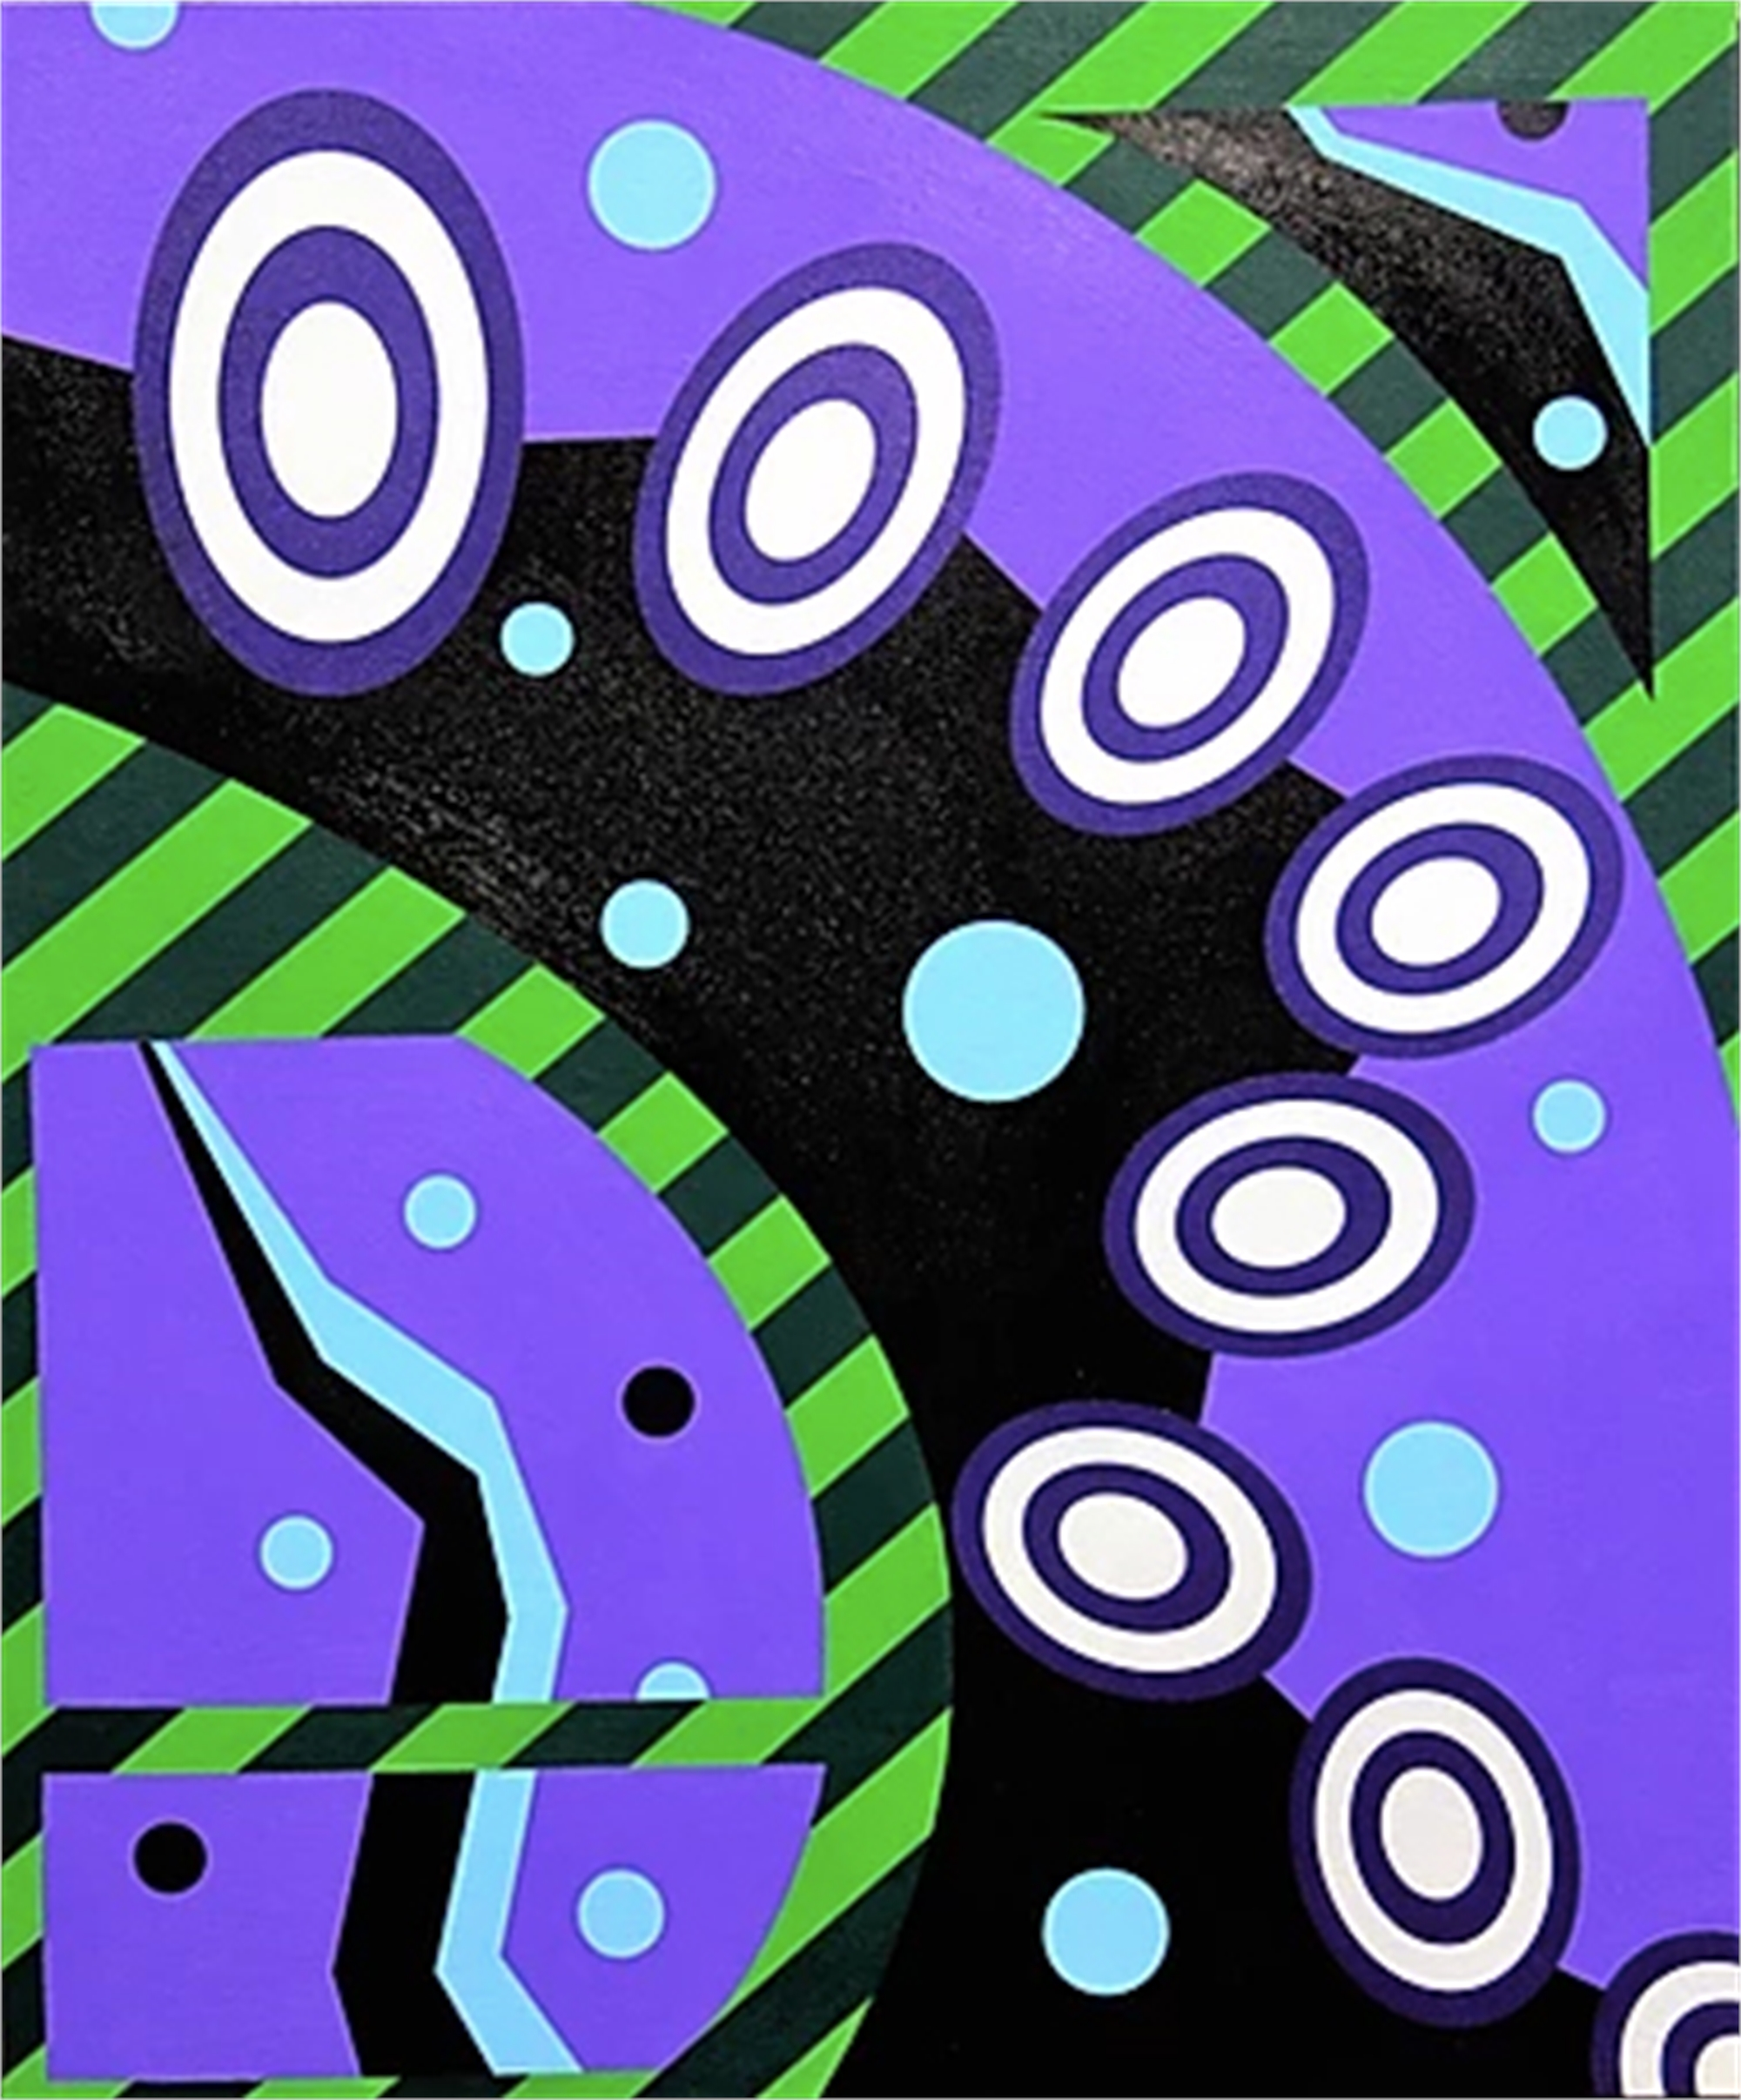 Bounce by Eric Ockrassa